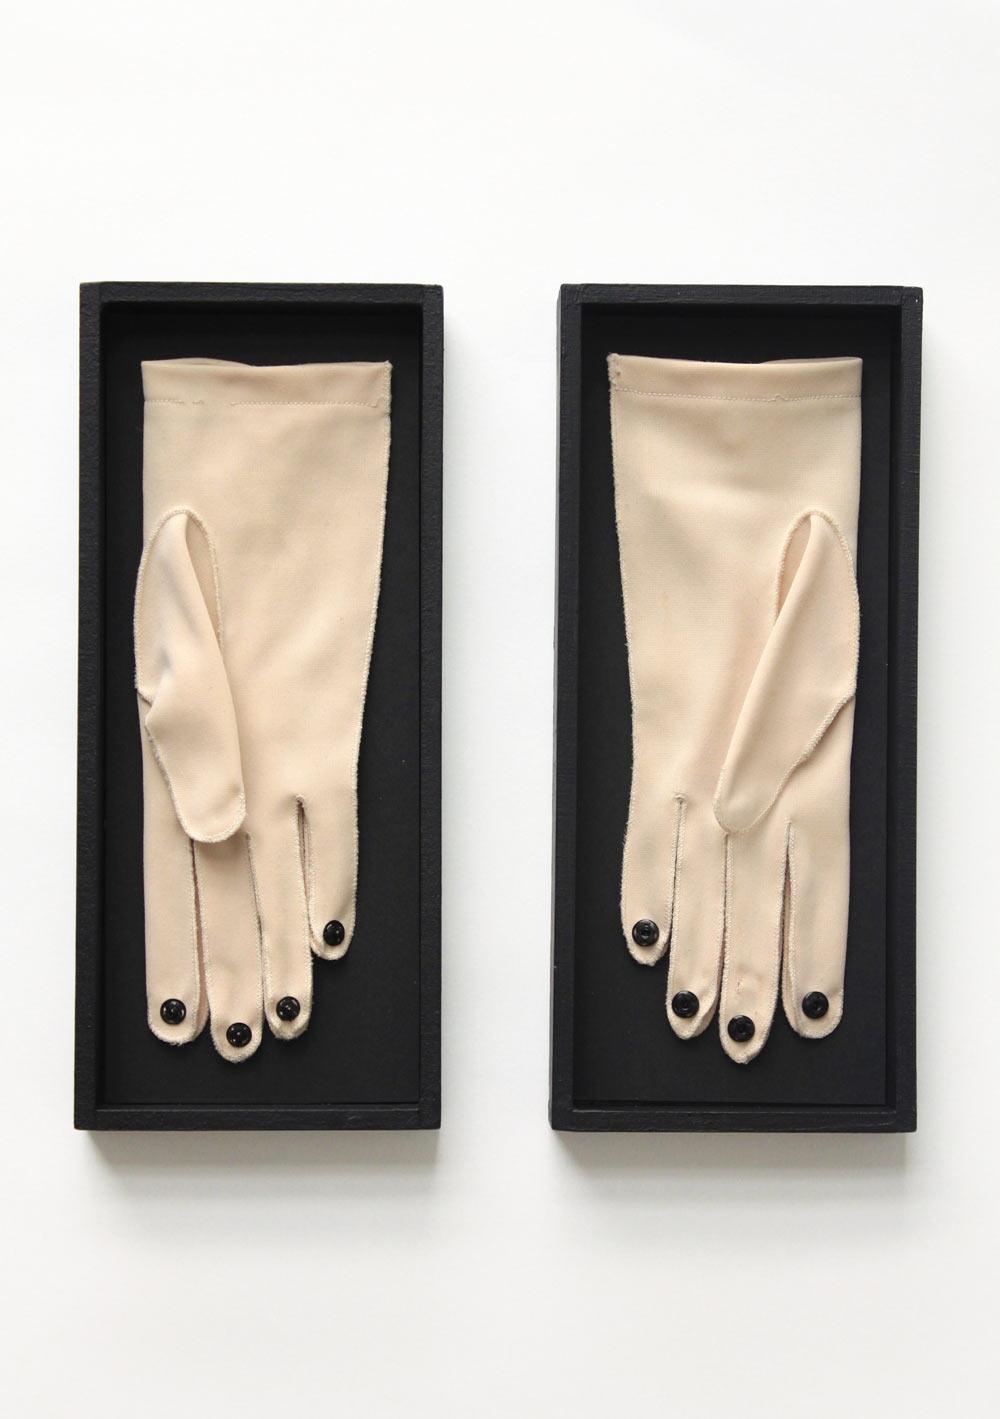 Unison, 26.4 11.2 (X2) Gloves,  - choiwong | ello